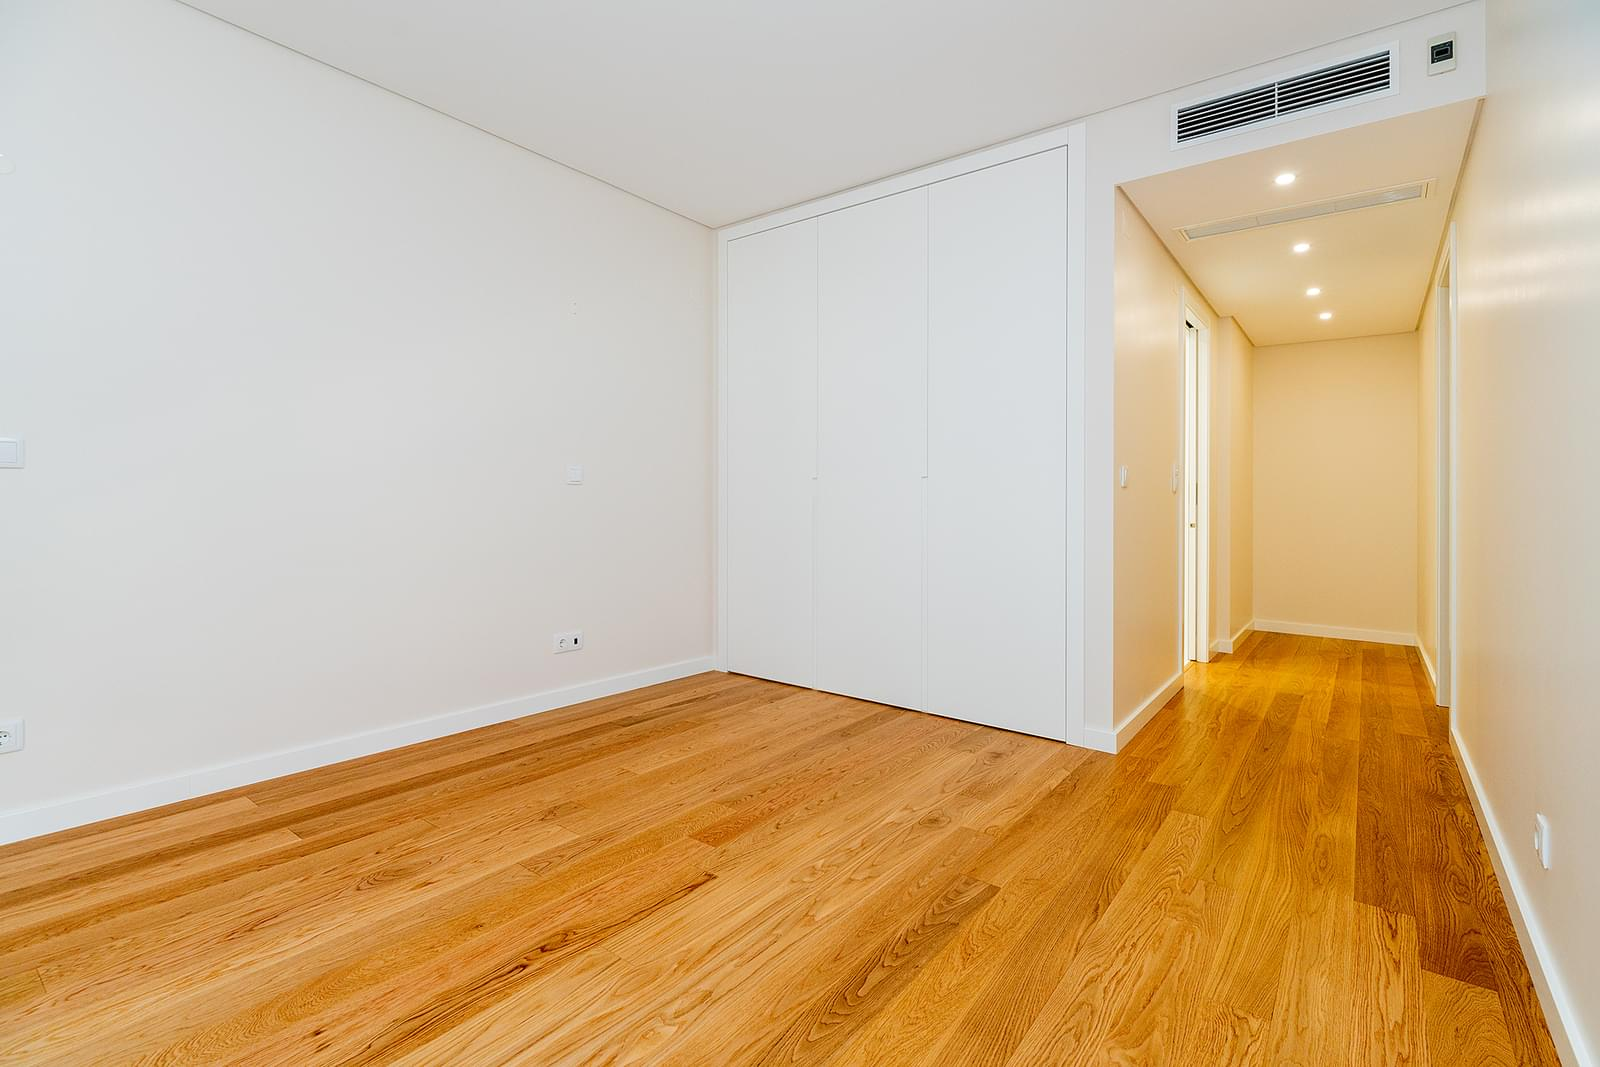 pf18846-apartamento-t2-lisboa-f602210d-a454-41b6-a9d5-bf95efa1fd6e